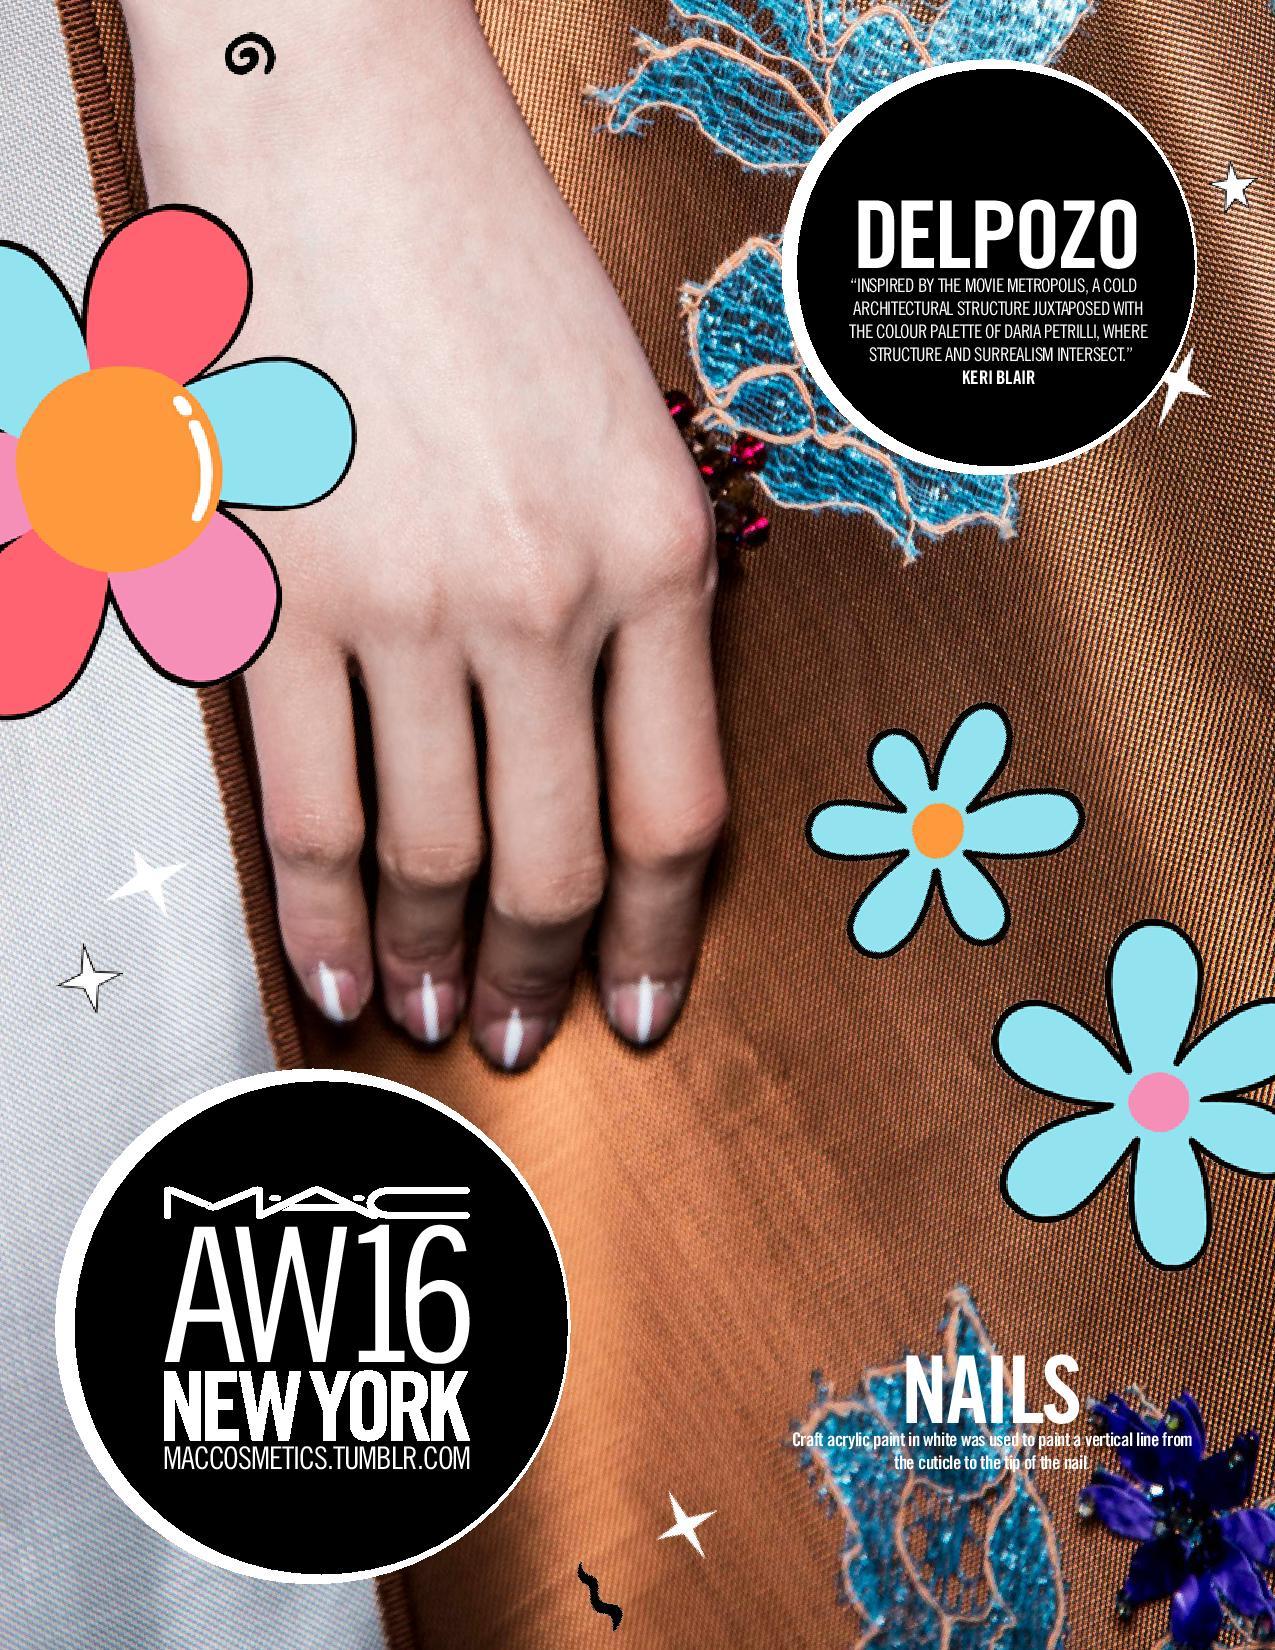 AW16_DAILY FACECHART_NEW YORK_FEB 17 (Delpozo, Michael Kors, Proenza Sch...-page-003